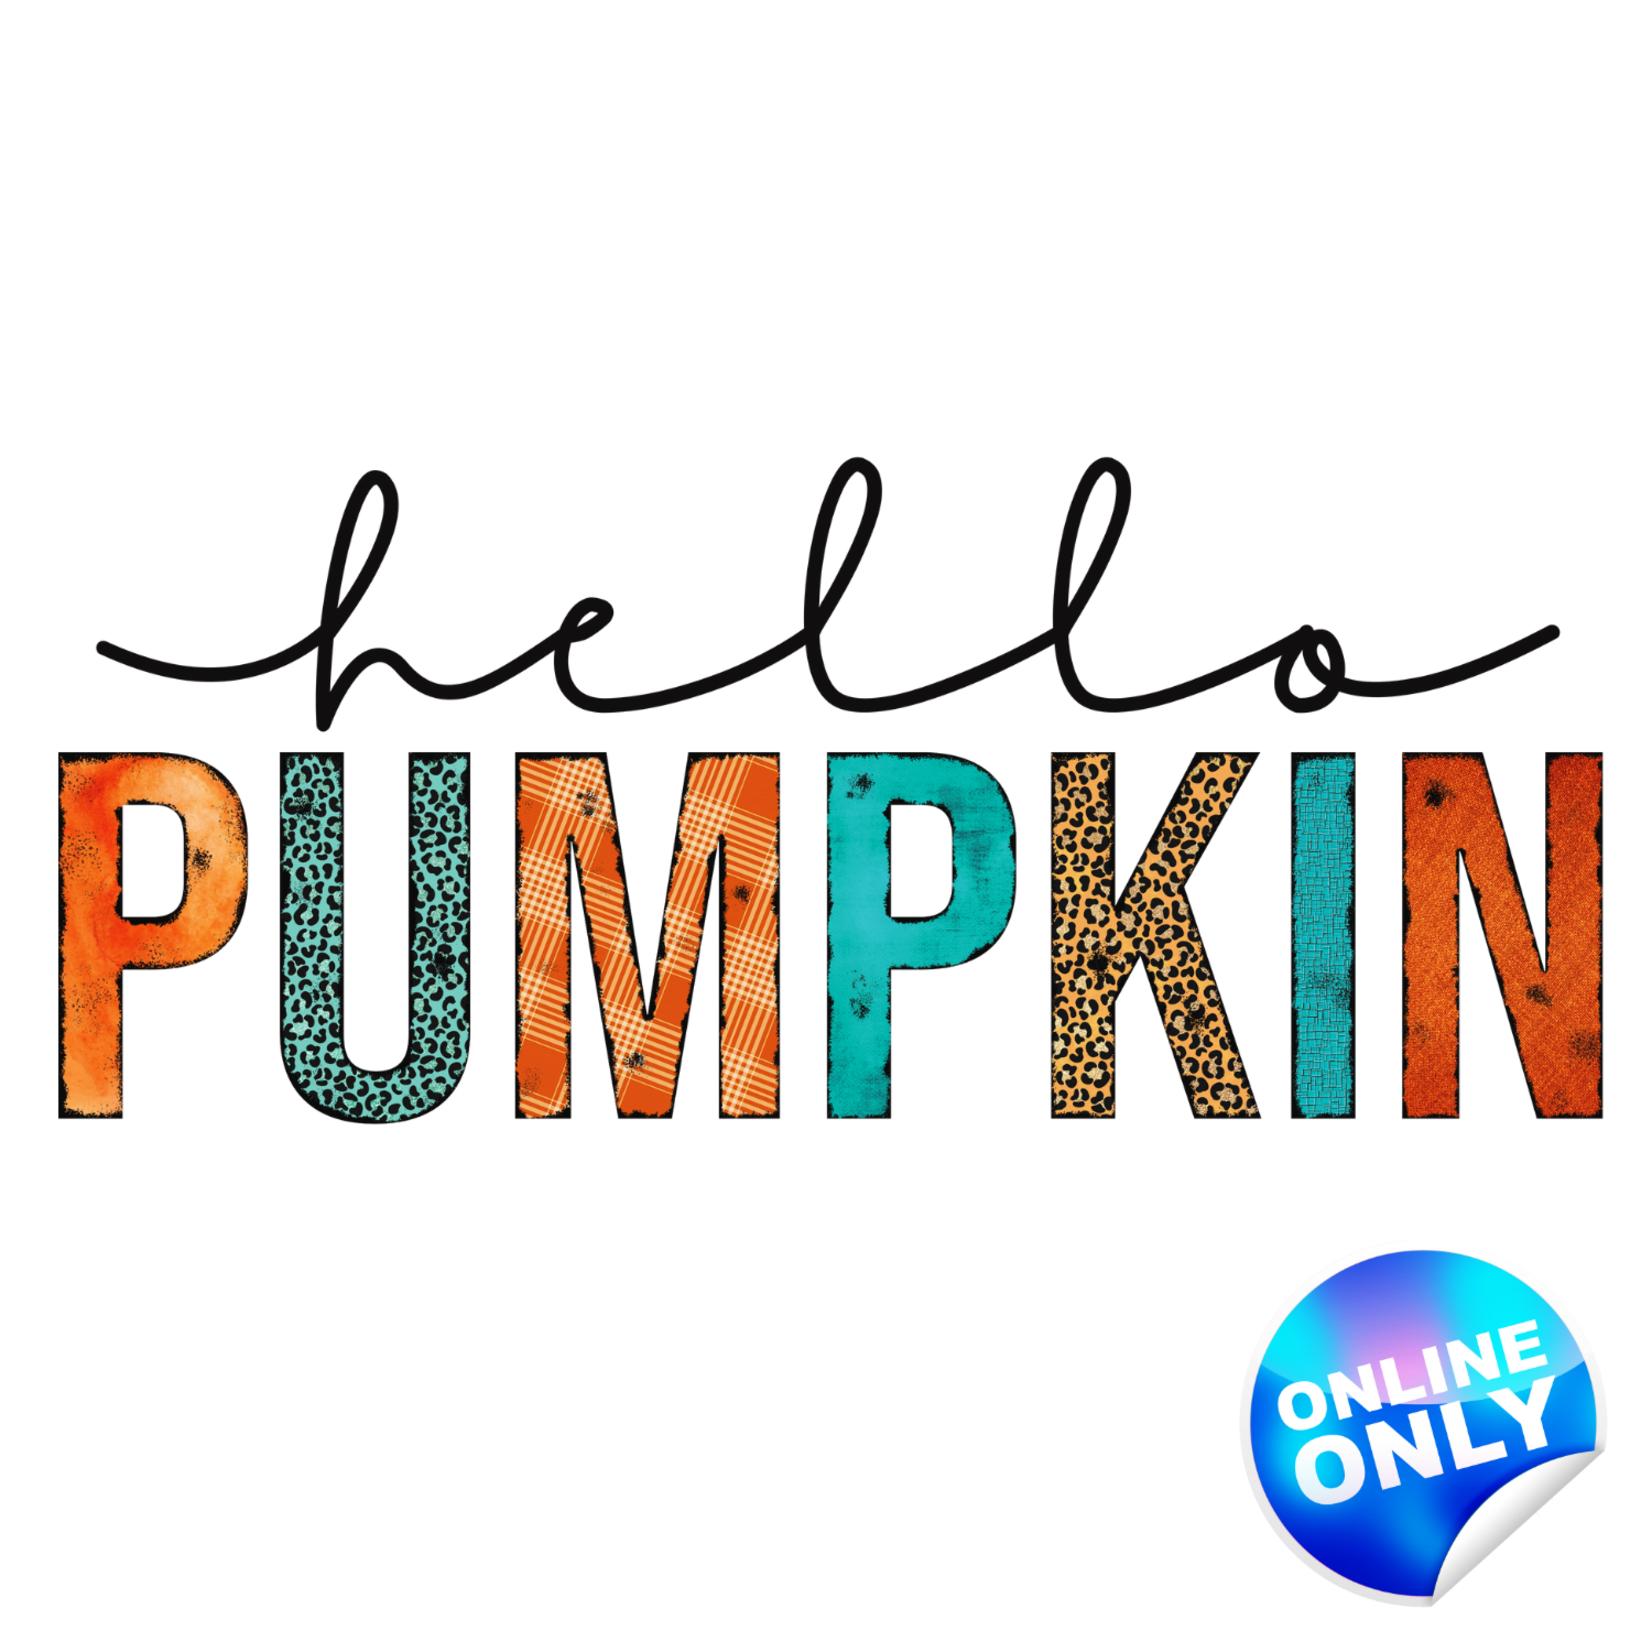 TVD Hello Pumpkin